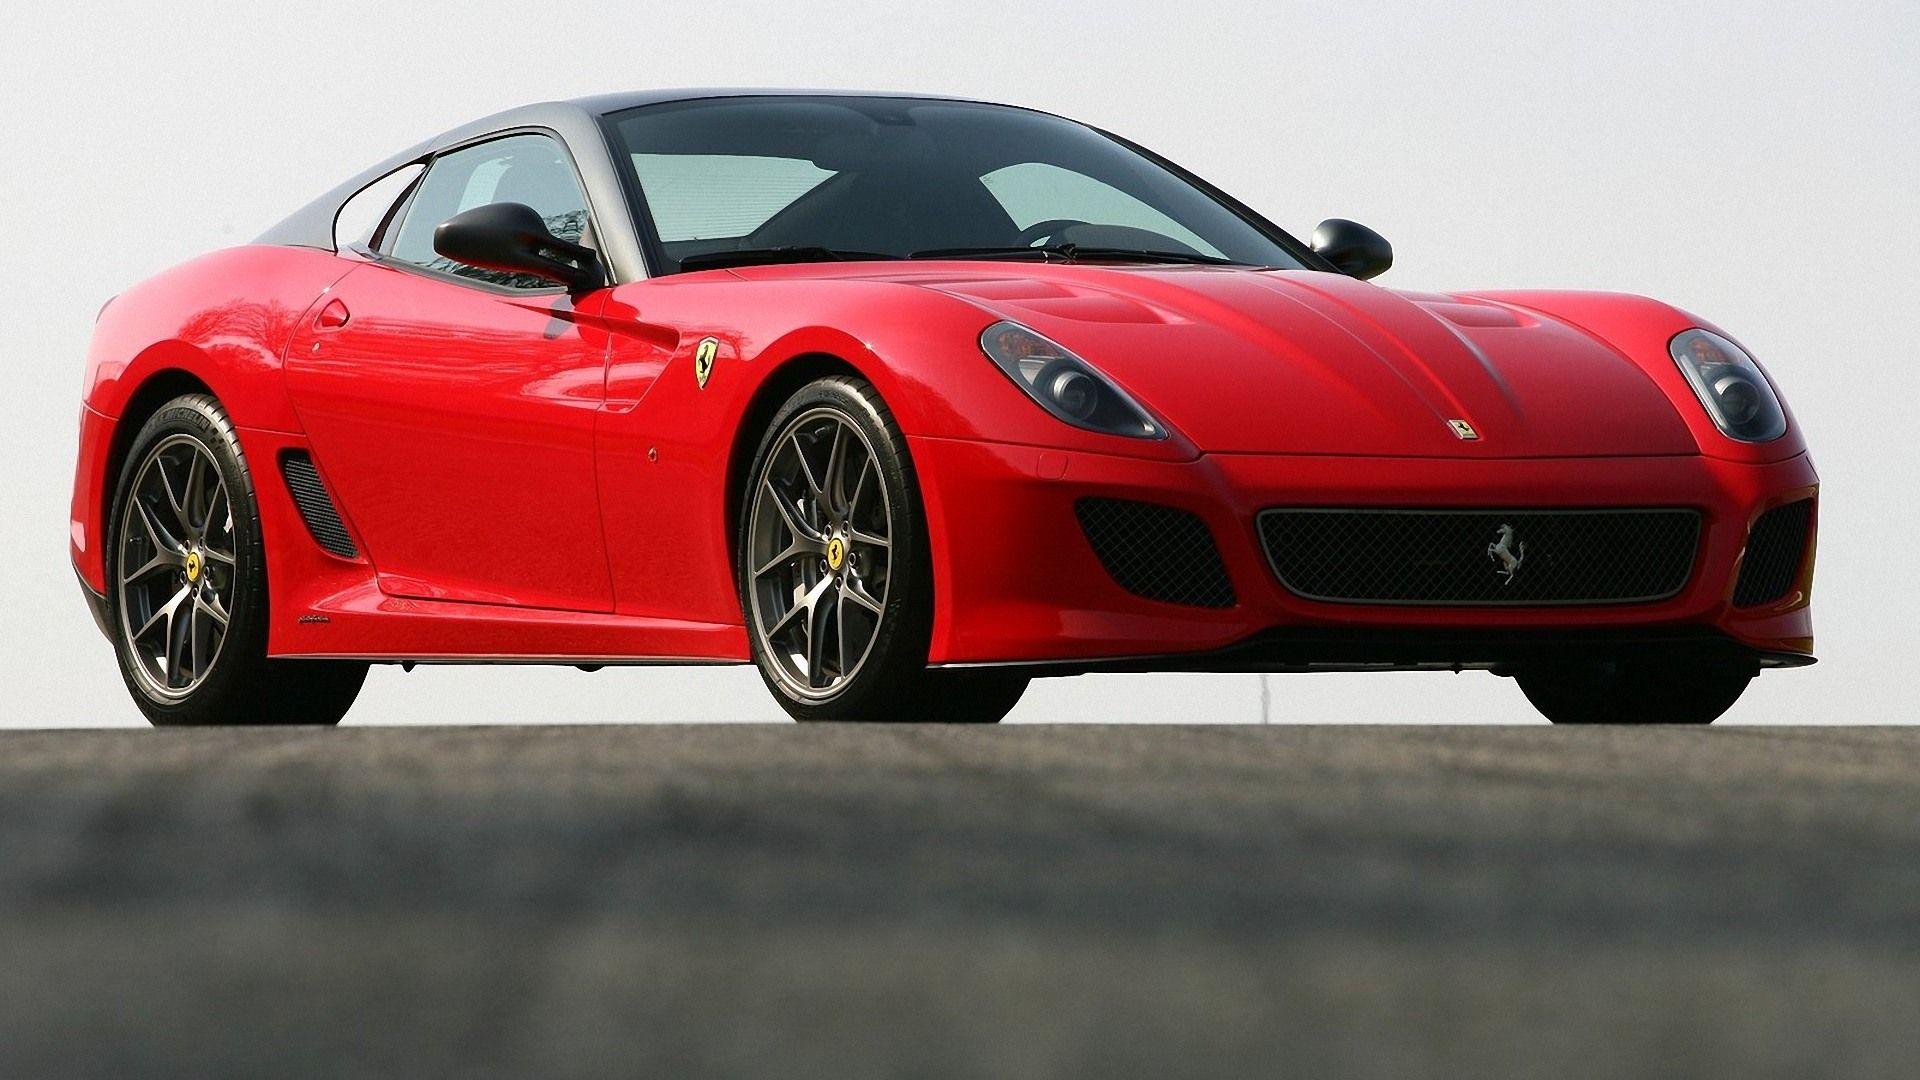 Ferrari 599 gto wallpaper 1920x1080 16768